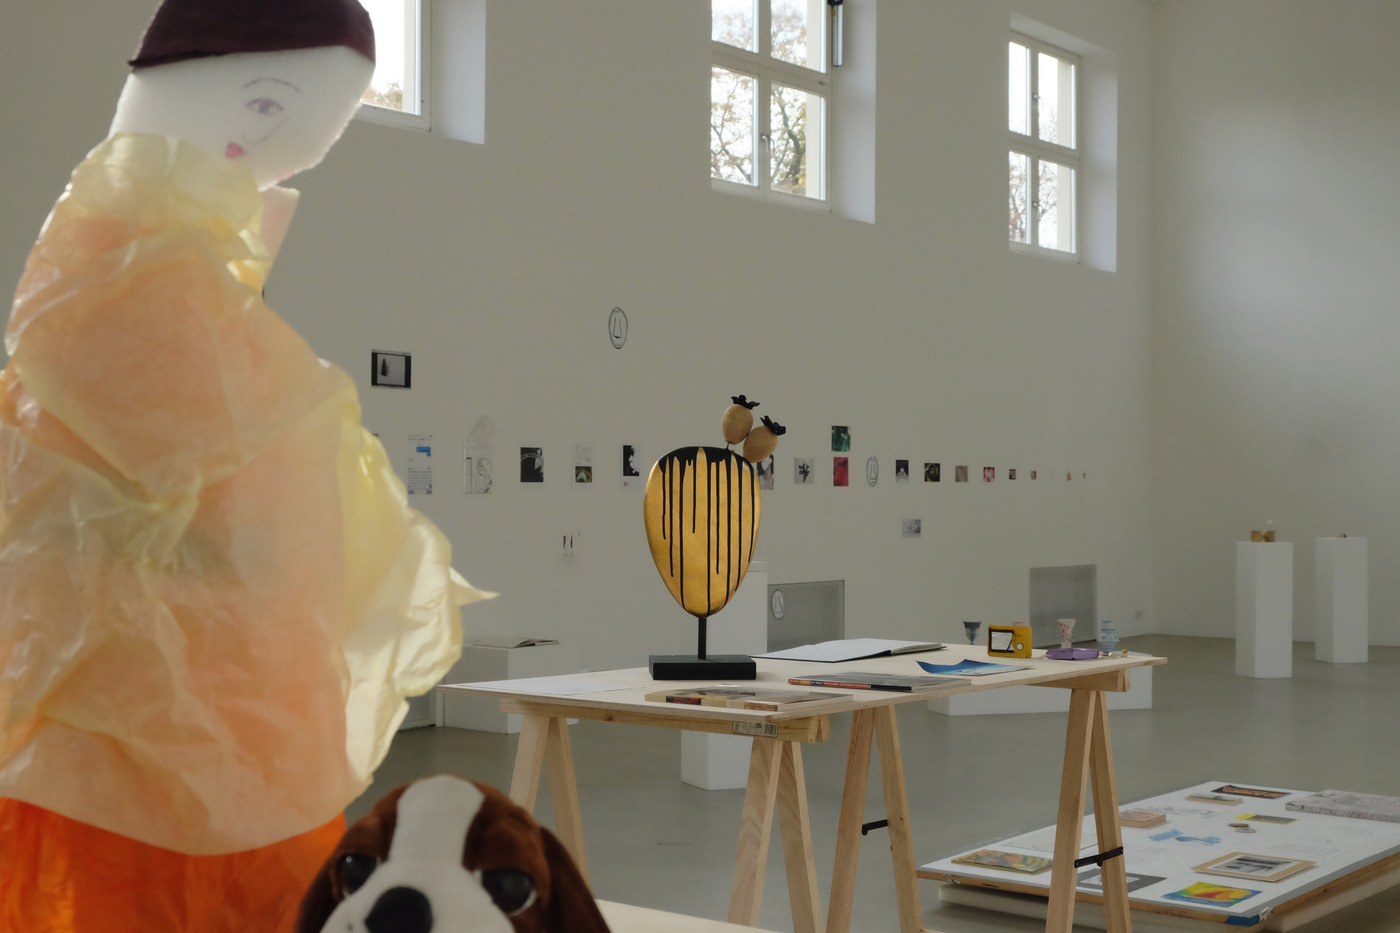 Darius Mikšys, Hayward & Tamayo, Exhibition View in Kunstverein München 2016 © Kunstverein München e.V._39